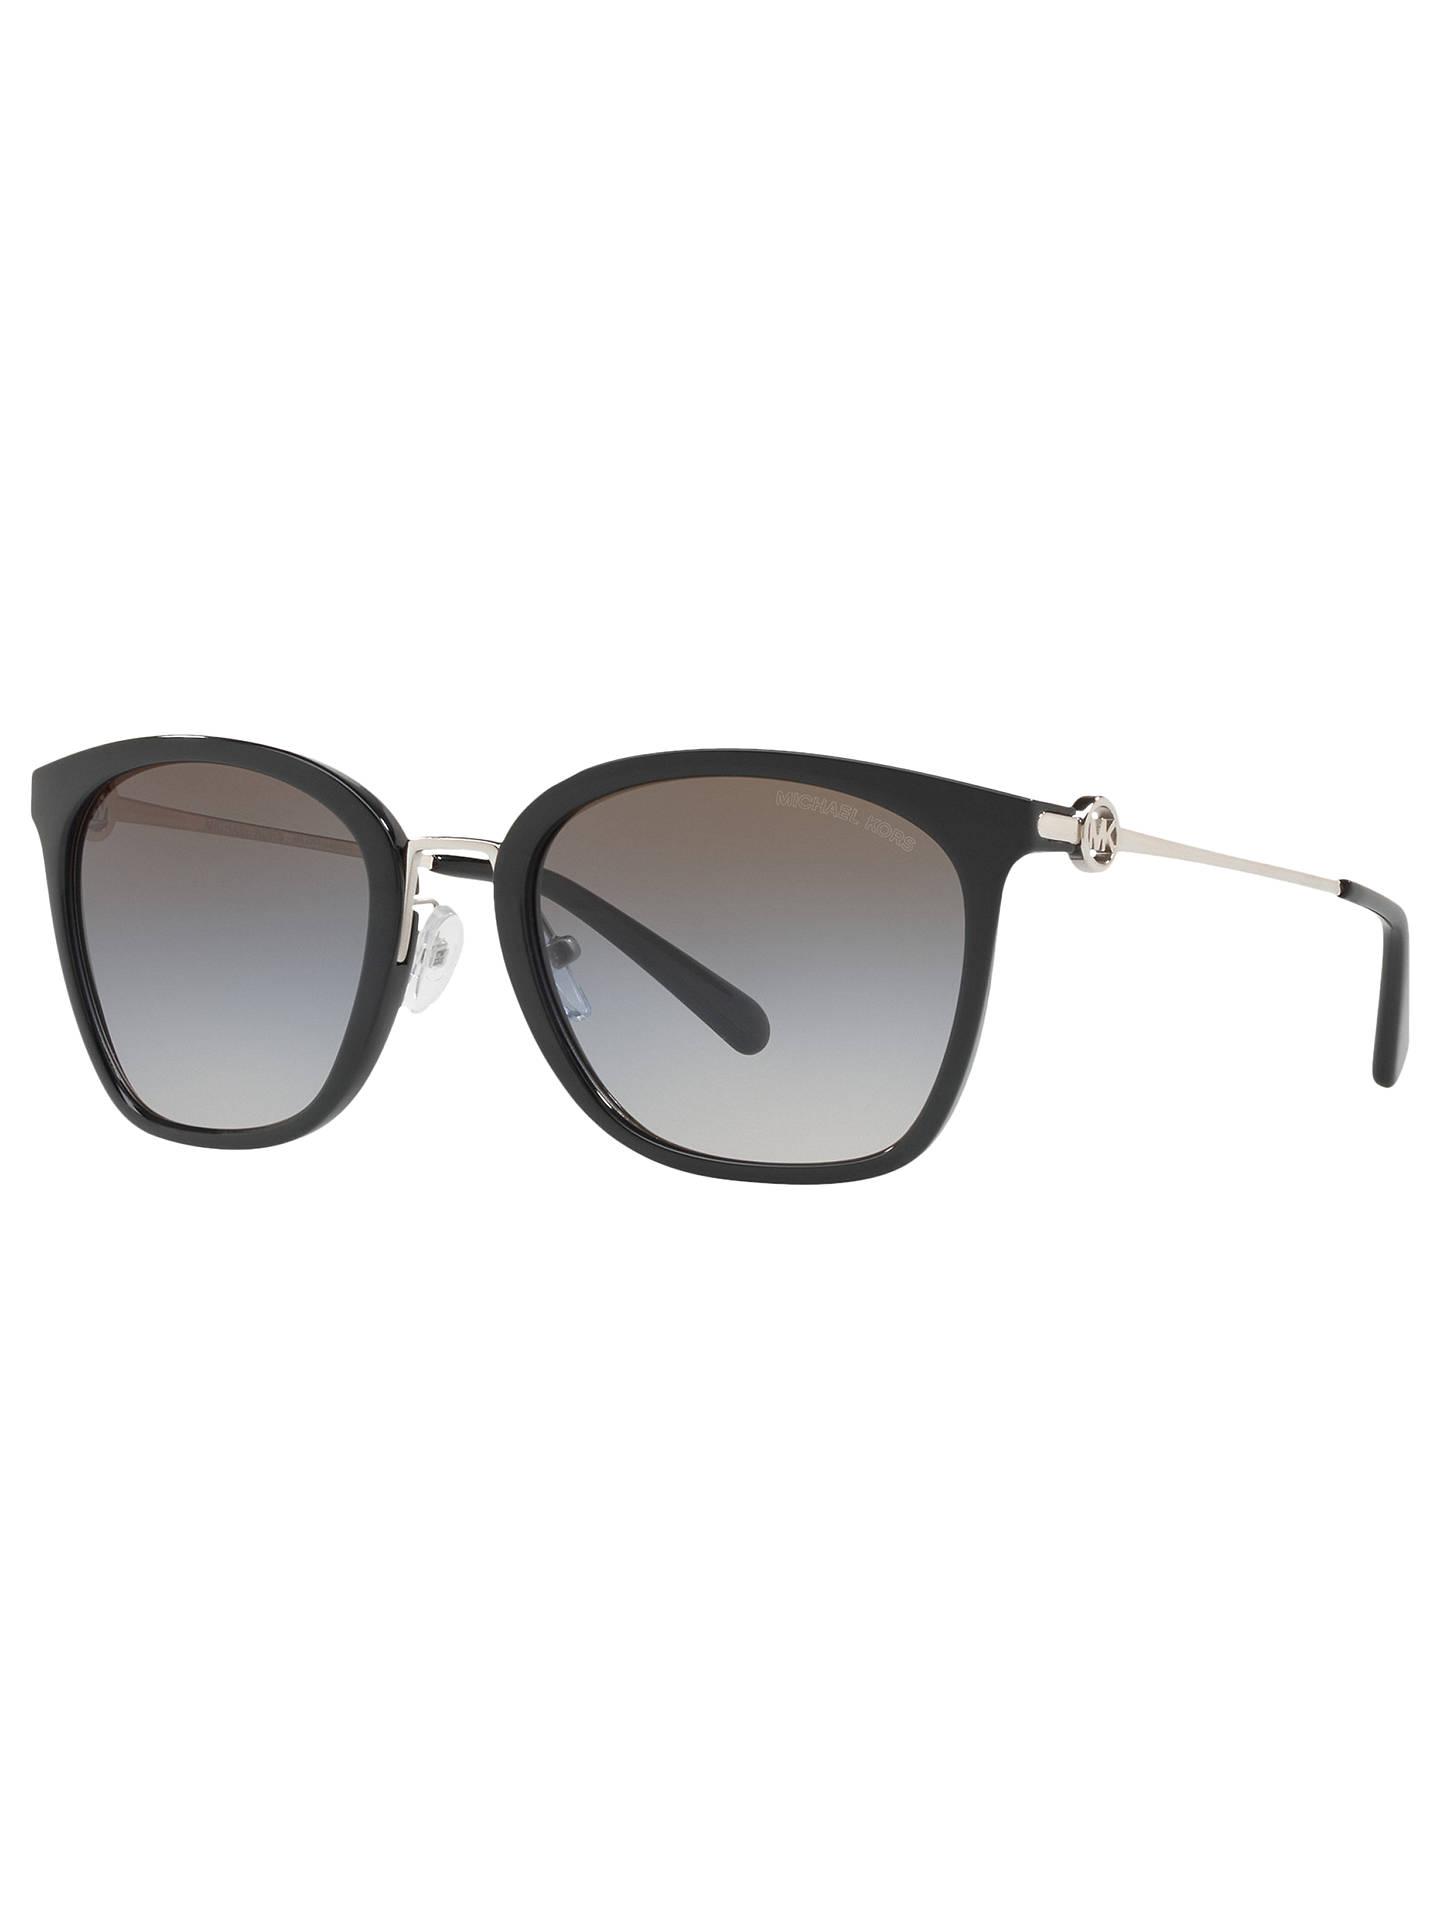 a479781f9c BuyMichael Kors MK2064 Women s Lugano Square Sunglasses